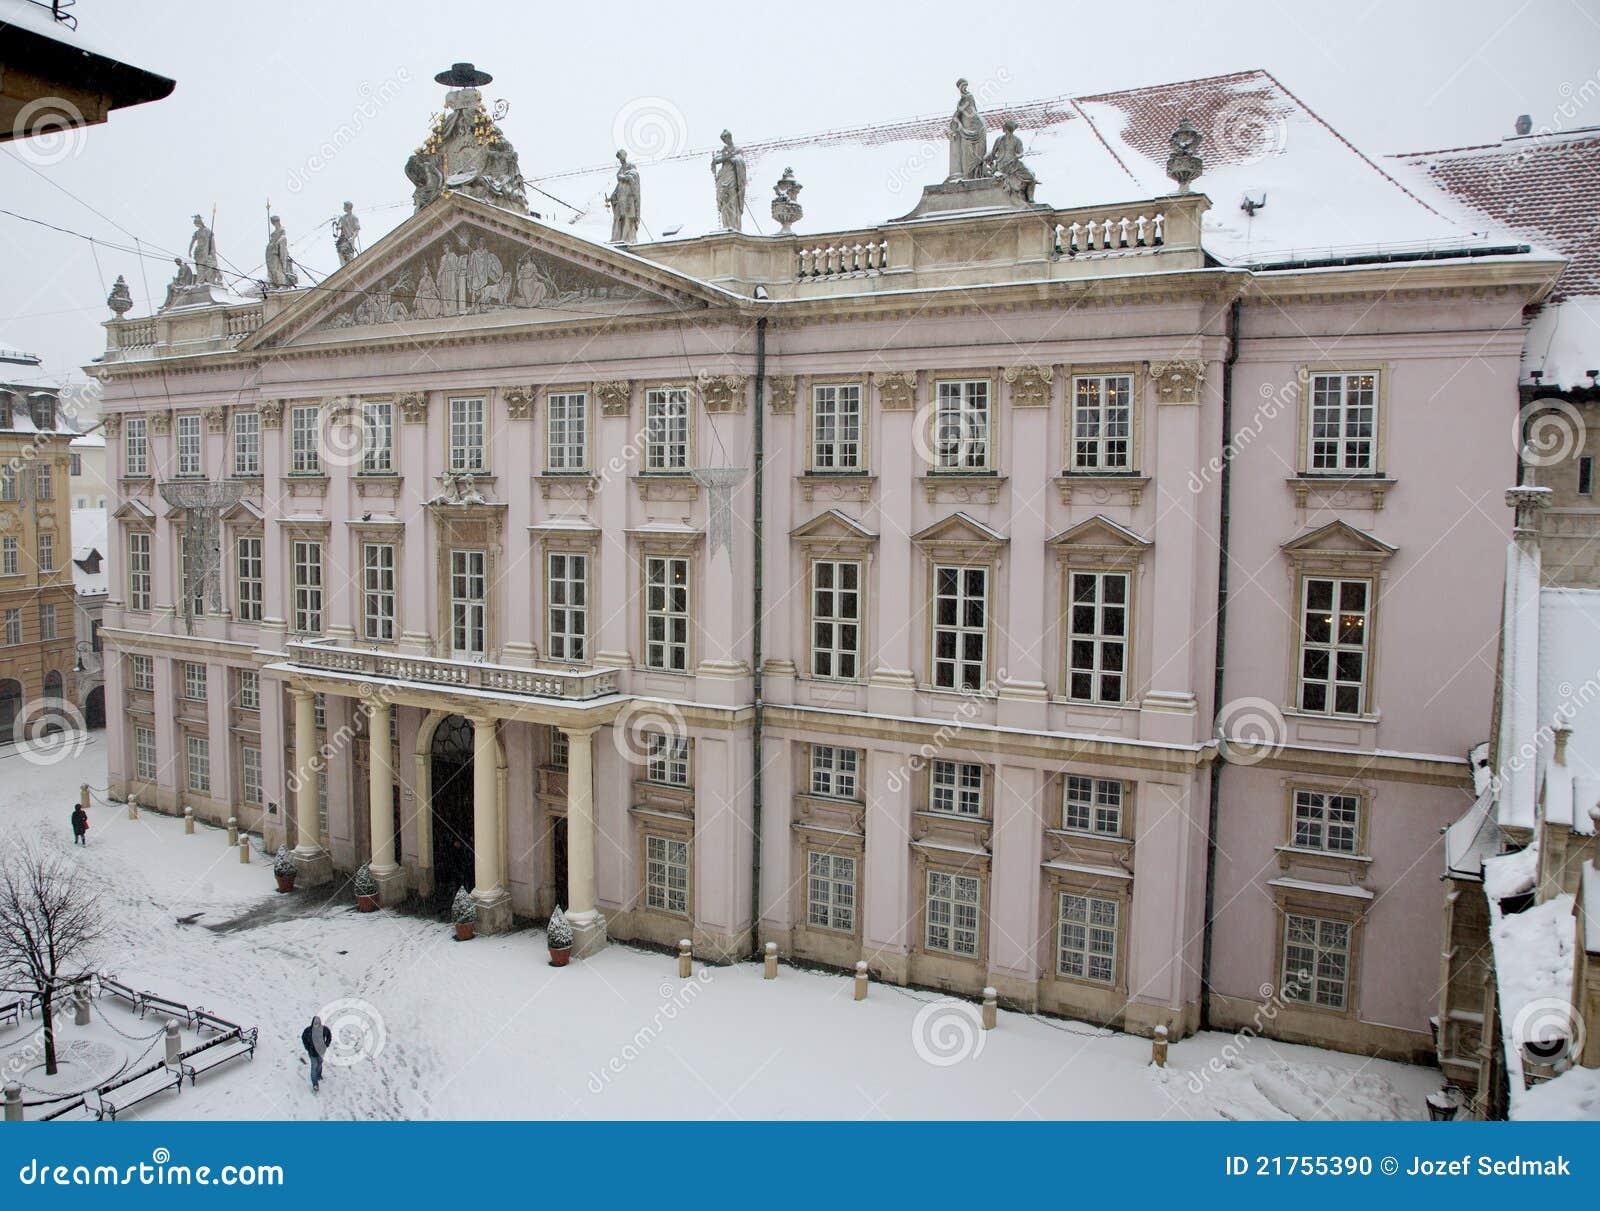 Bratislava metropolita pałac